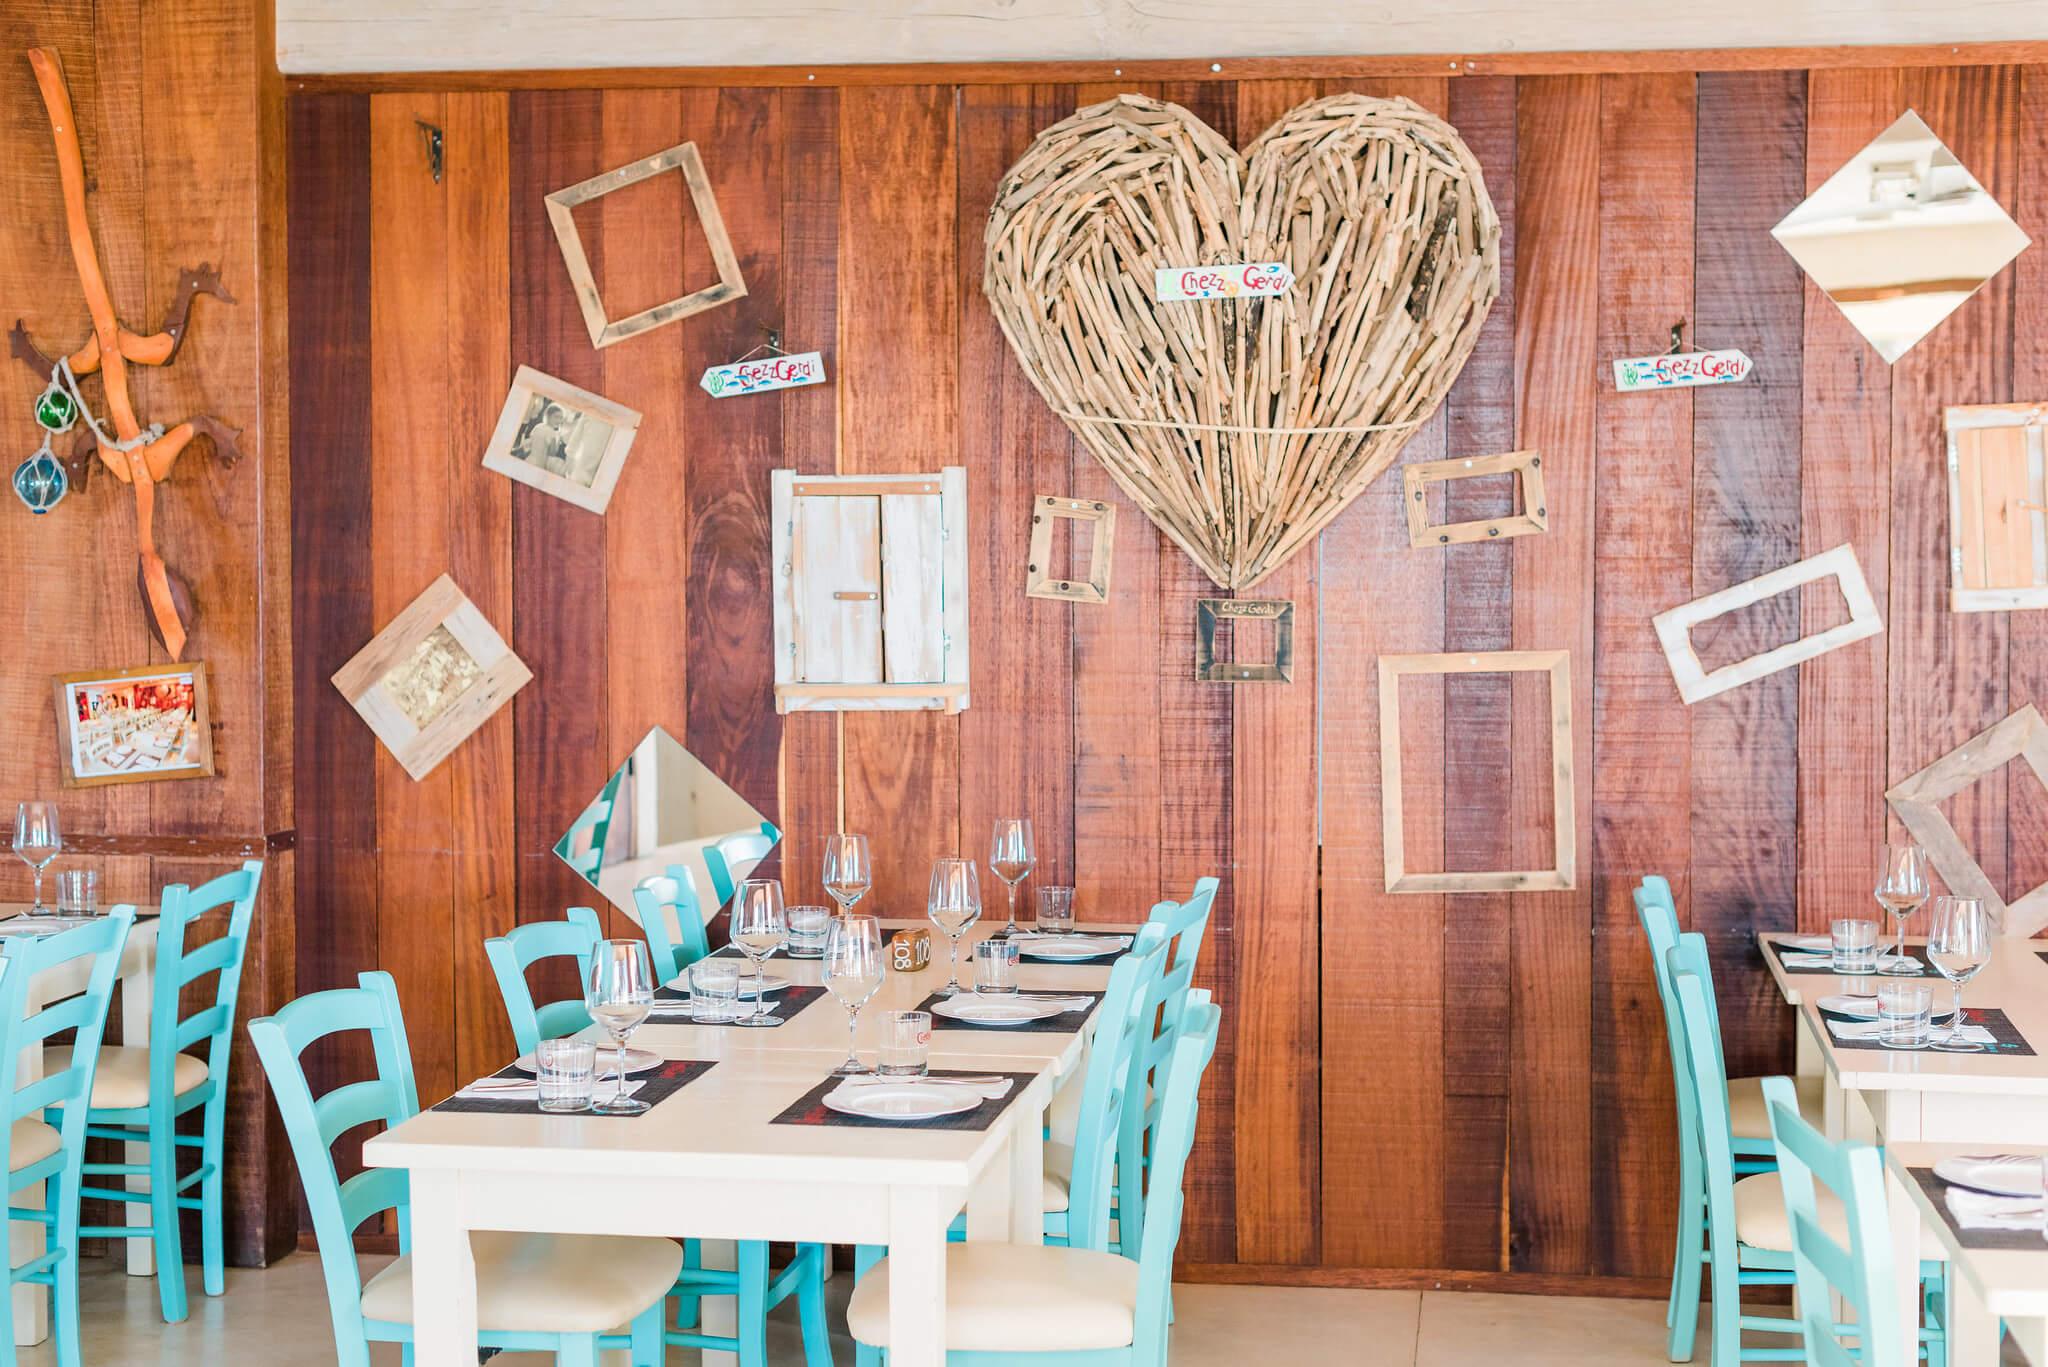 https://www.white-ibiza.com/wp-content/uploads/2020/03/formentera-beach-restaurants-chezz-gerdi-2020-03.jpg